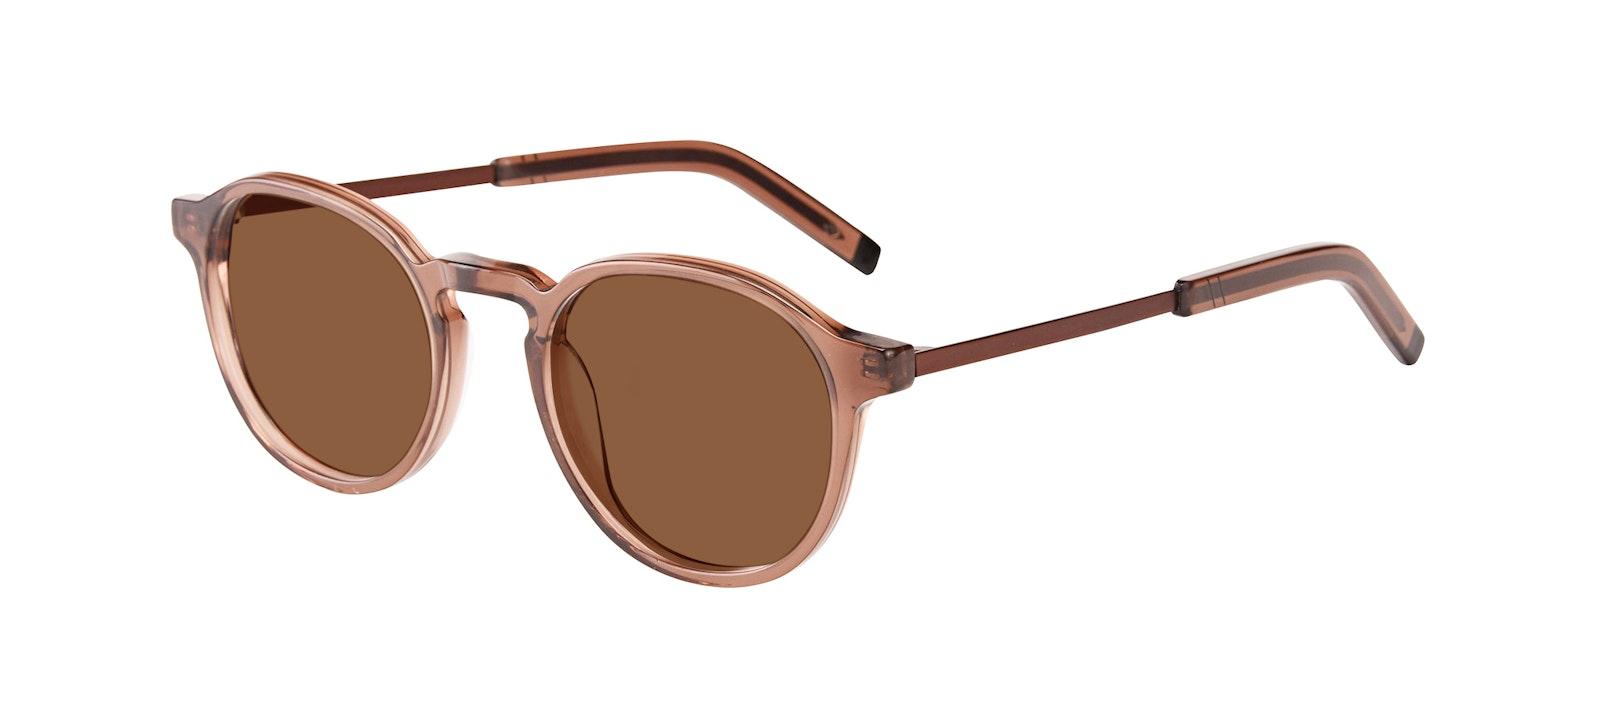 Affordable Fashion Glasses Round Sunglasses Men Prime XL Terra Tilt